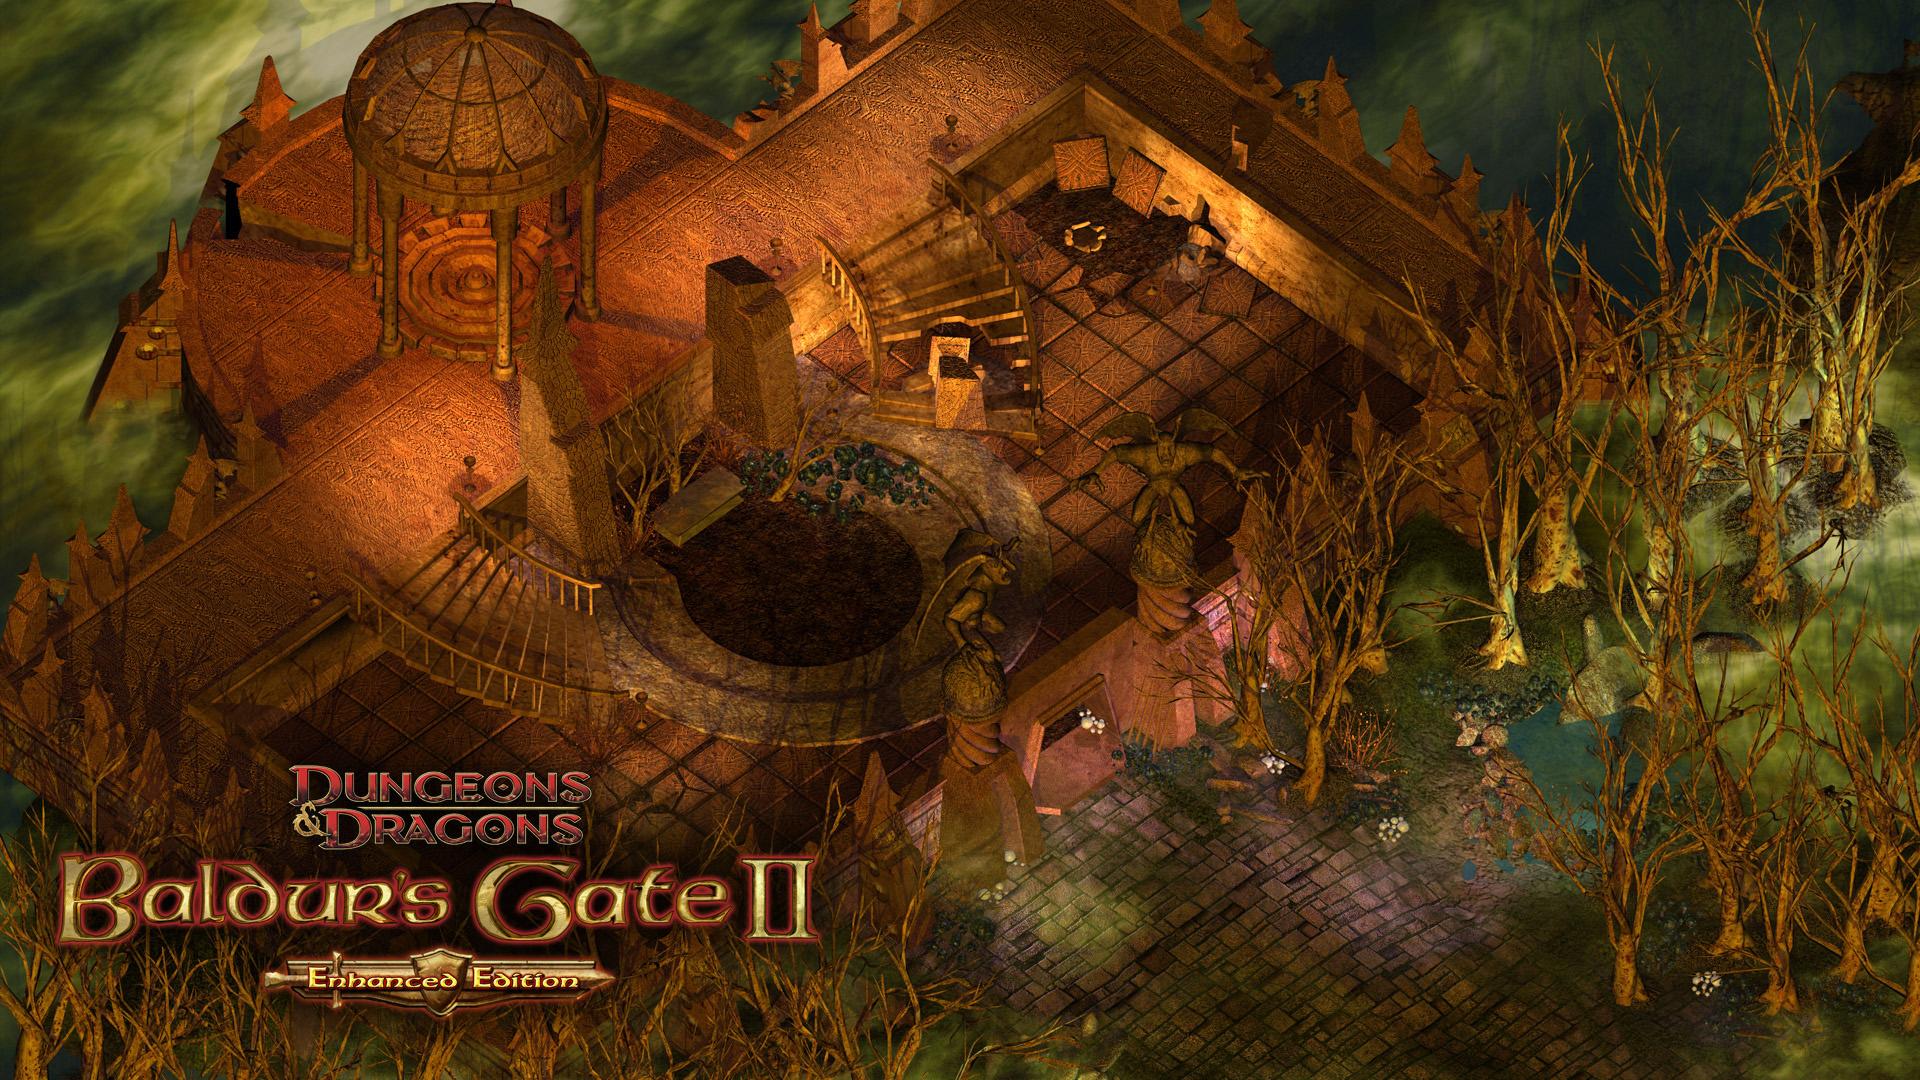 Imágenes De Baldurs Gate Ii Enhanced Edition Meristation